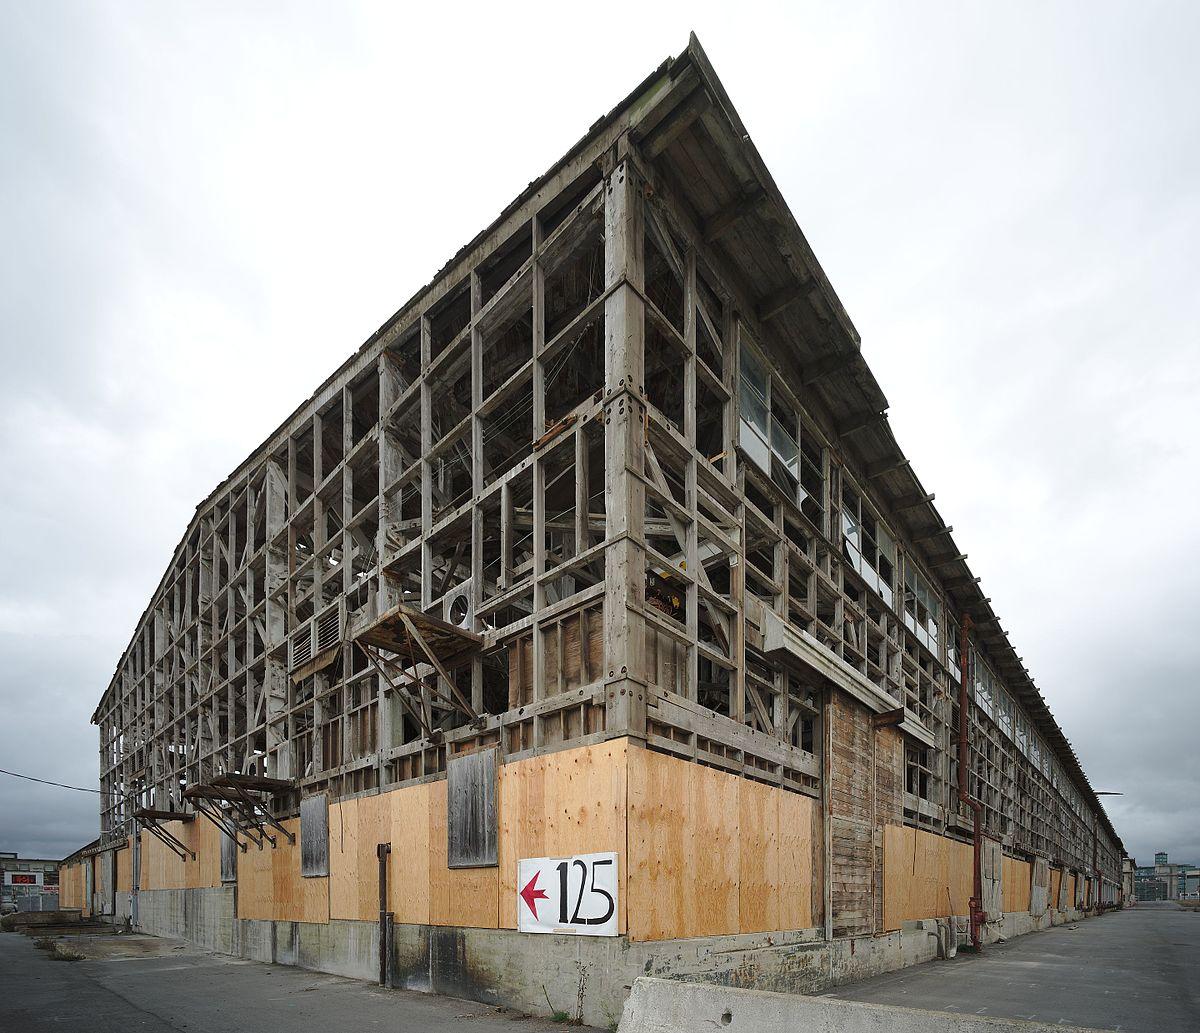 File:Abandoned Building At Hunters Point Shipyard, San